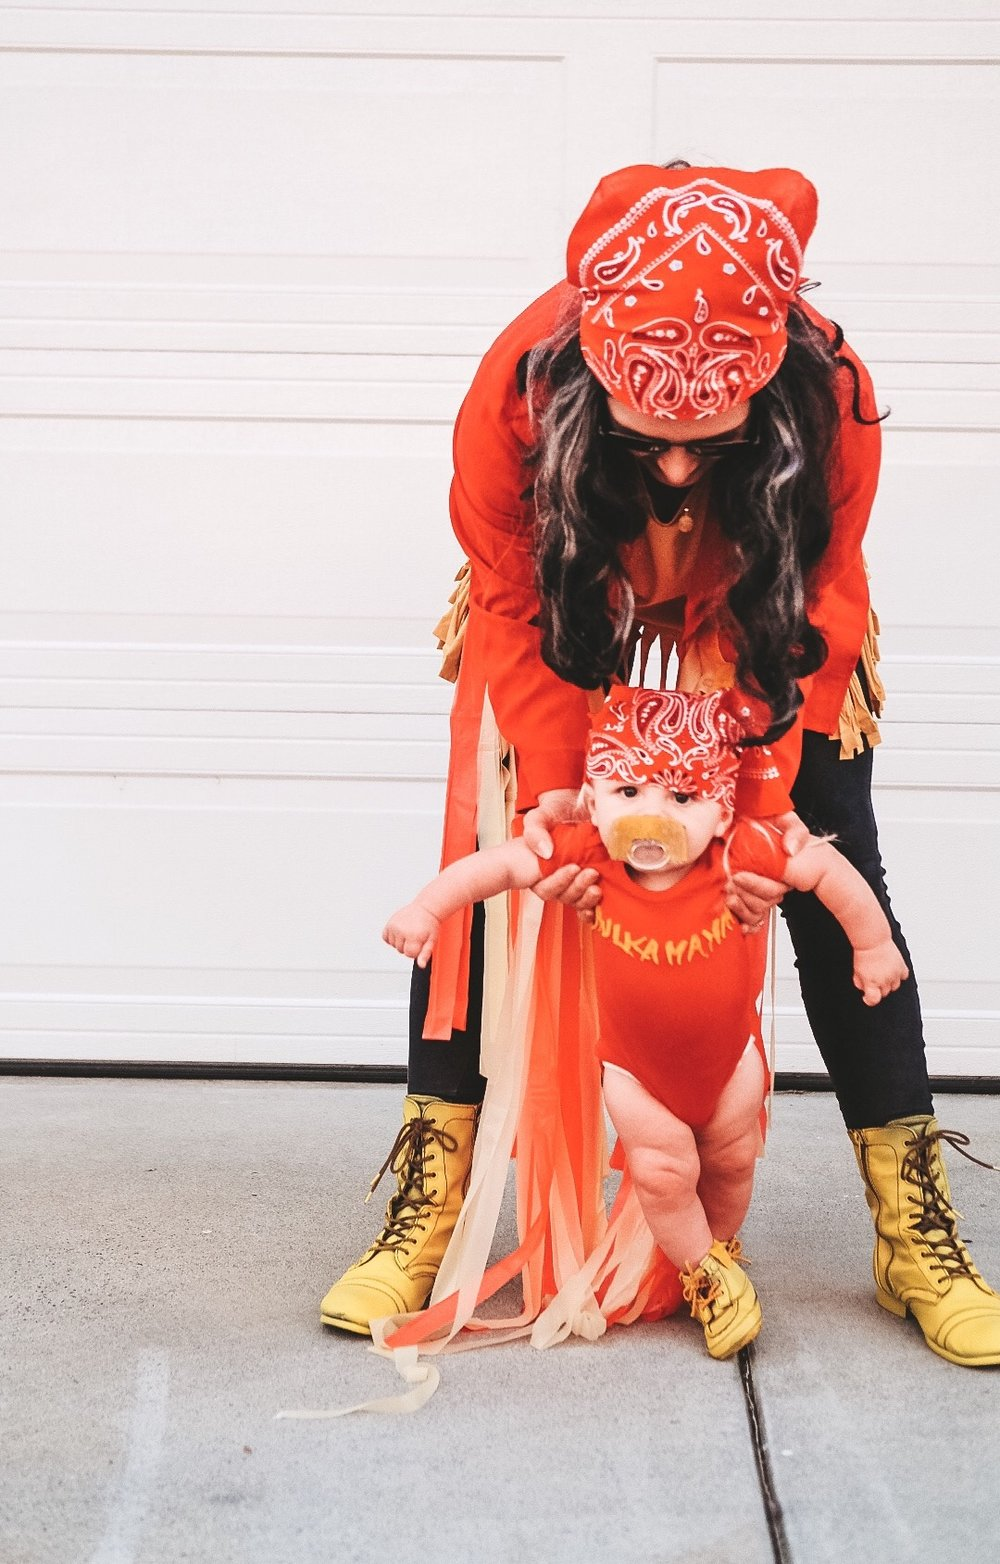 DIY baby Hulk Hogan costume.  DIY Macho Man Randy Savage costume.  Family Halloween costume.